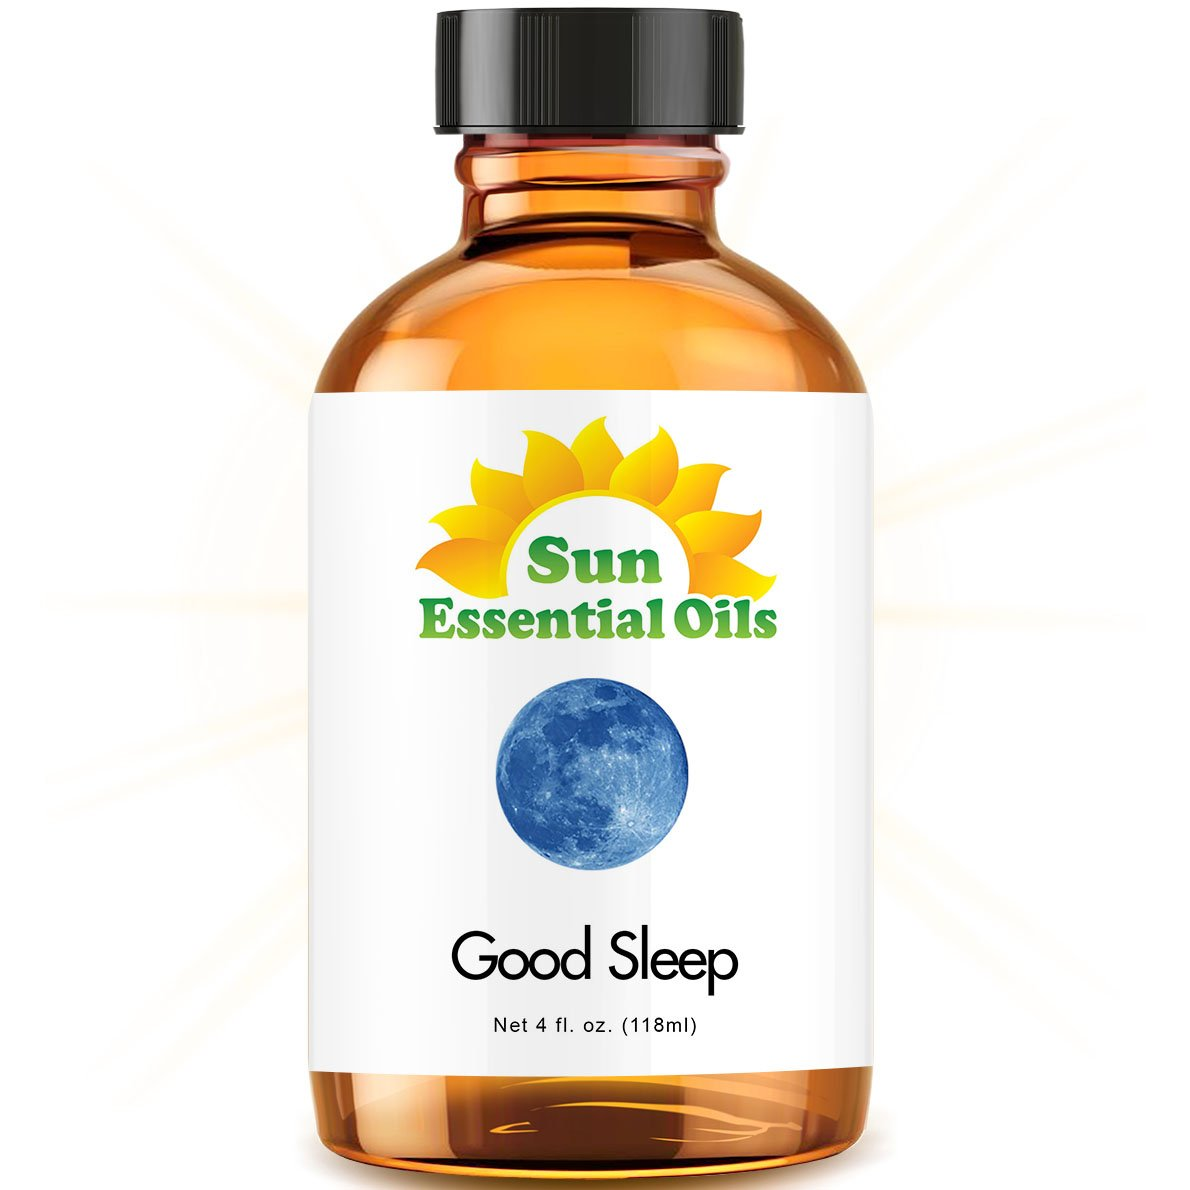 Good Sleep Blend Essential Oil (Huge 4oz Bottle) Bulk Good Sleep Blend Oil - 4 Ounce